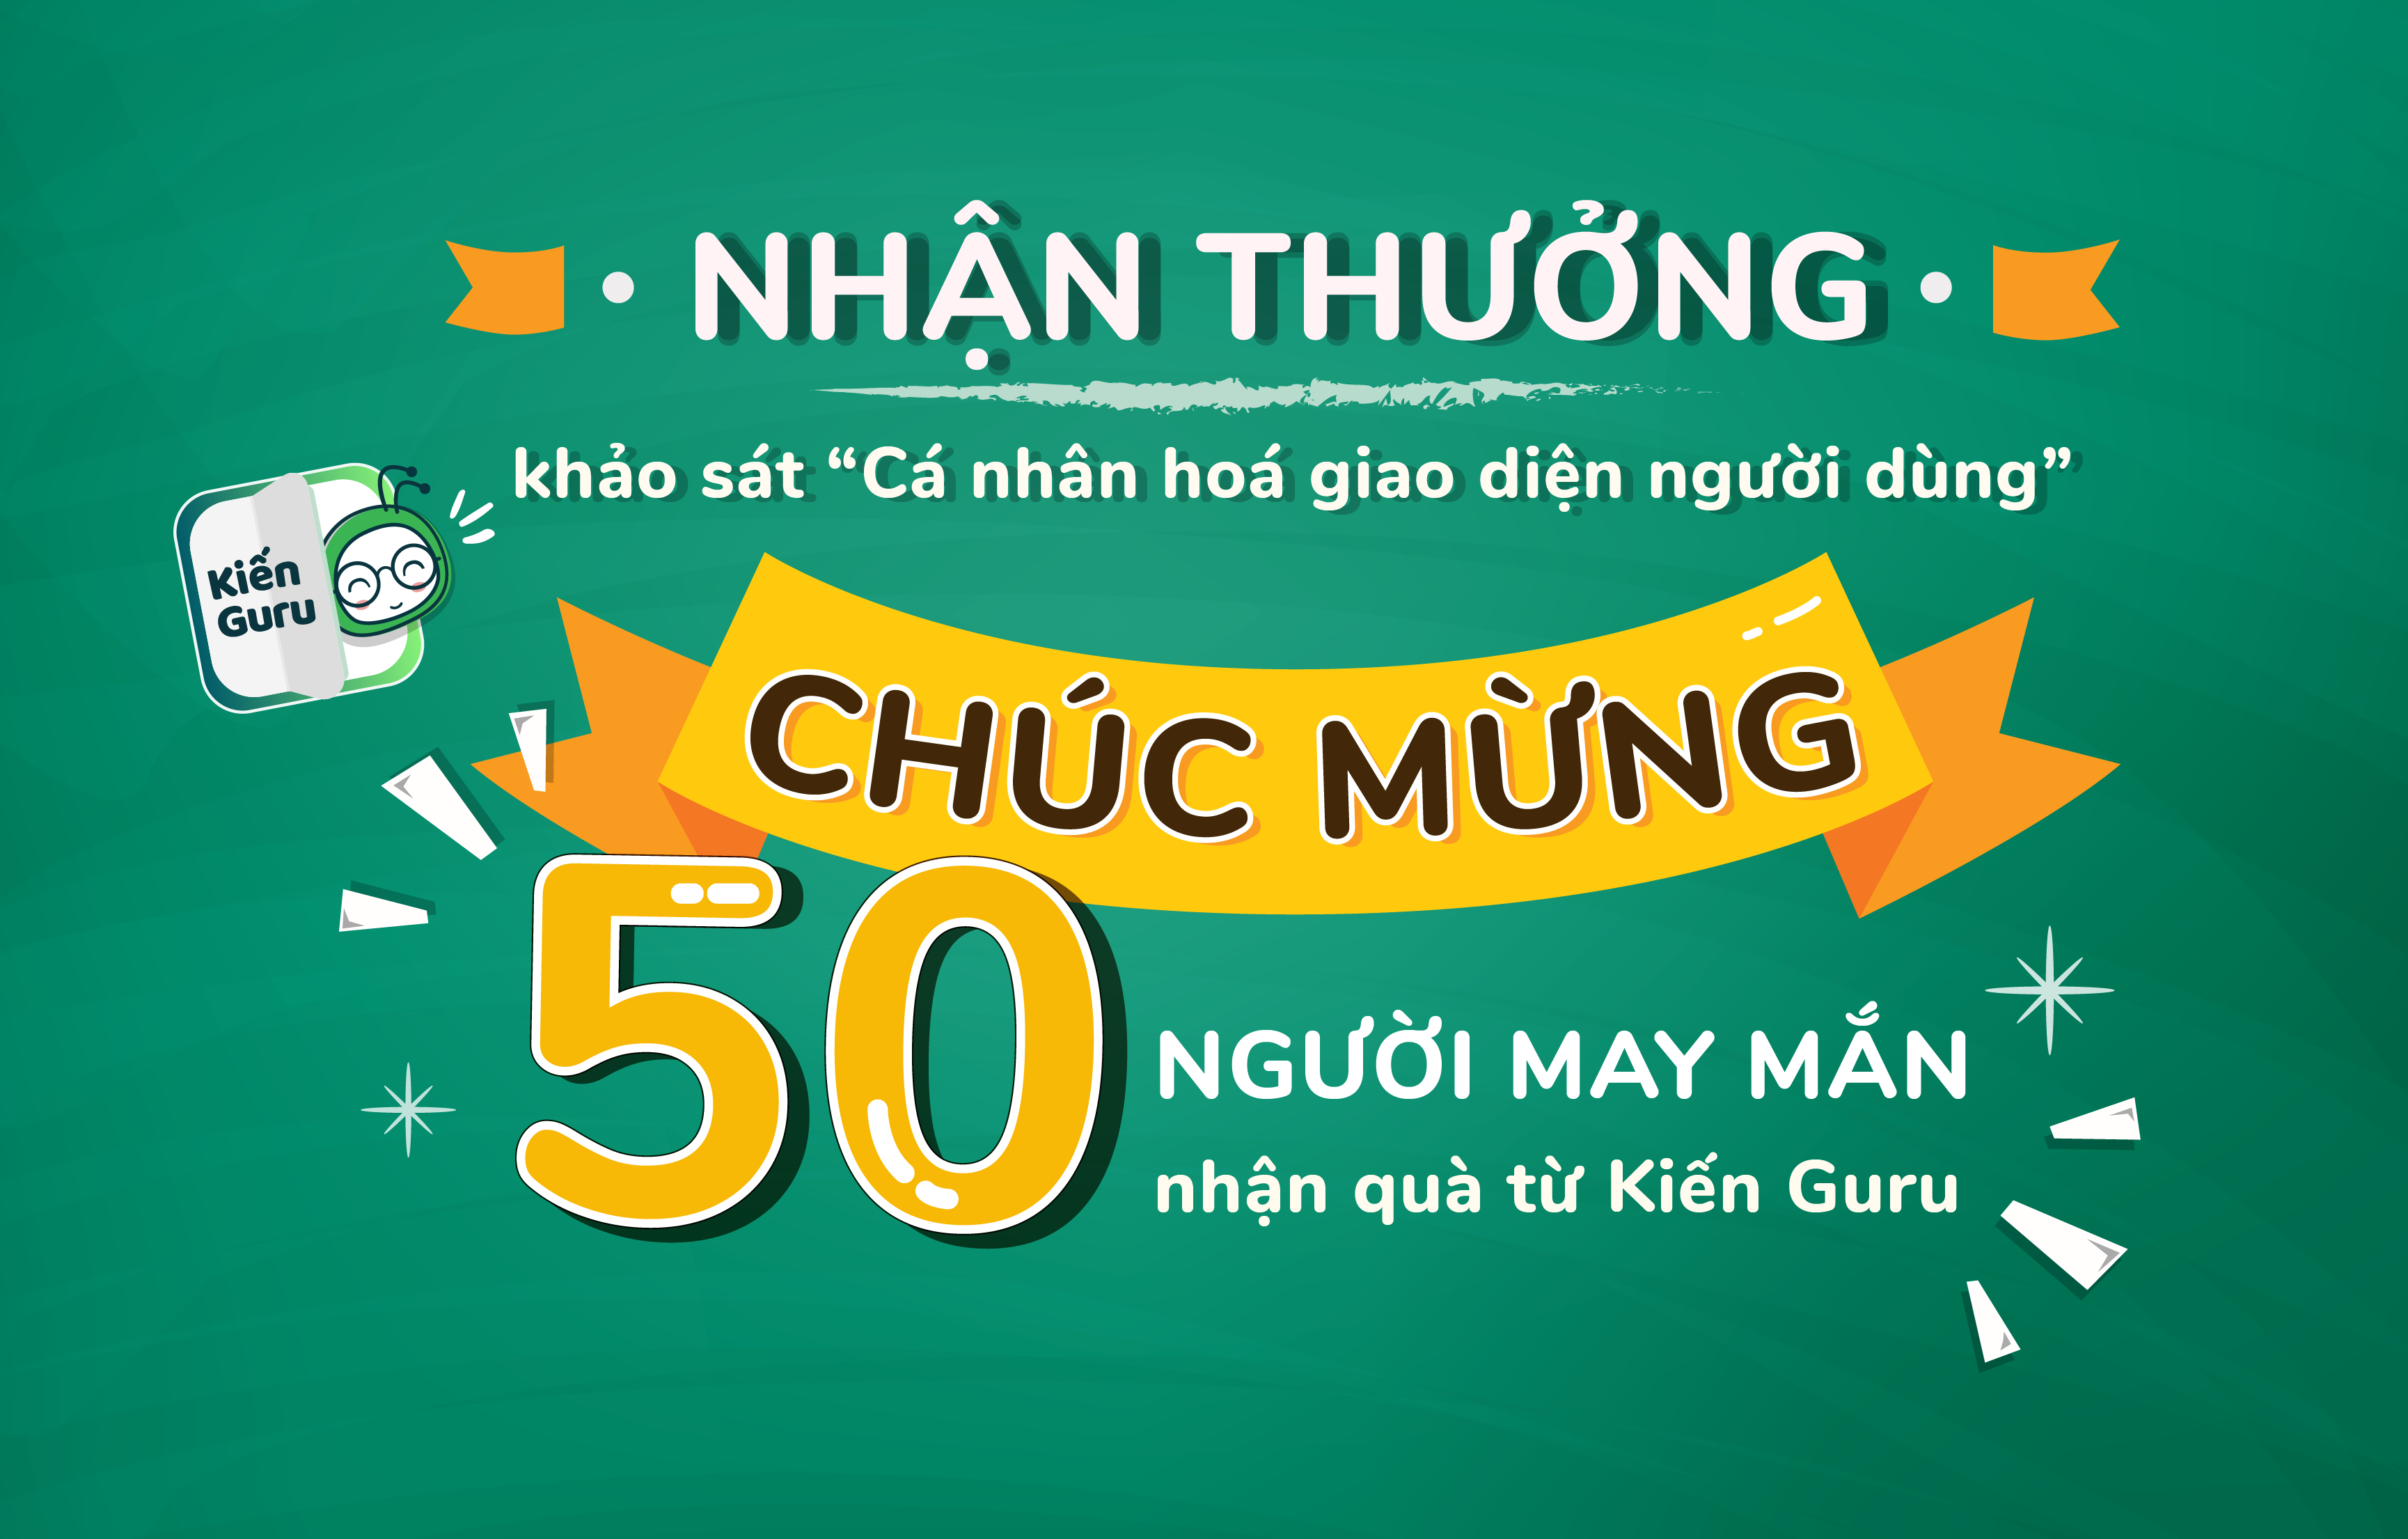 khao-sat-ca-nhan-hoa-giao-dien-nguoi-dung